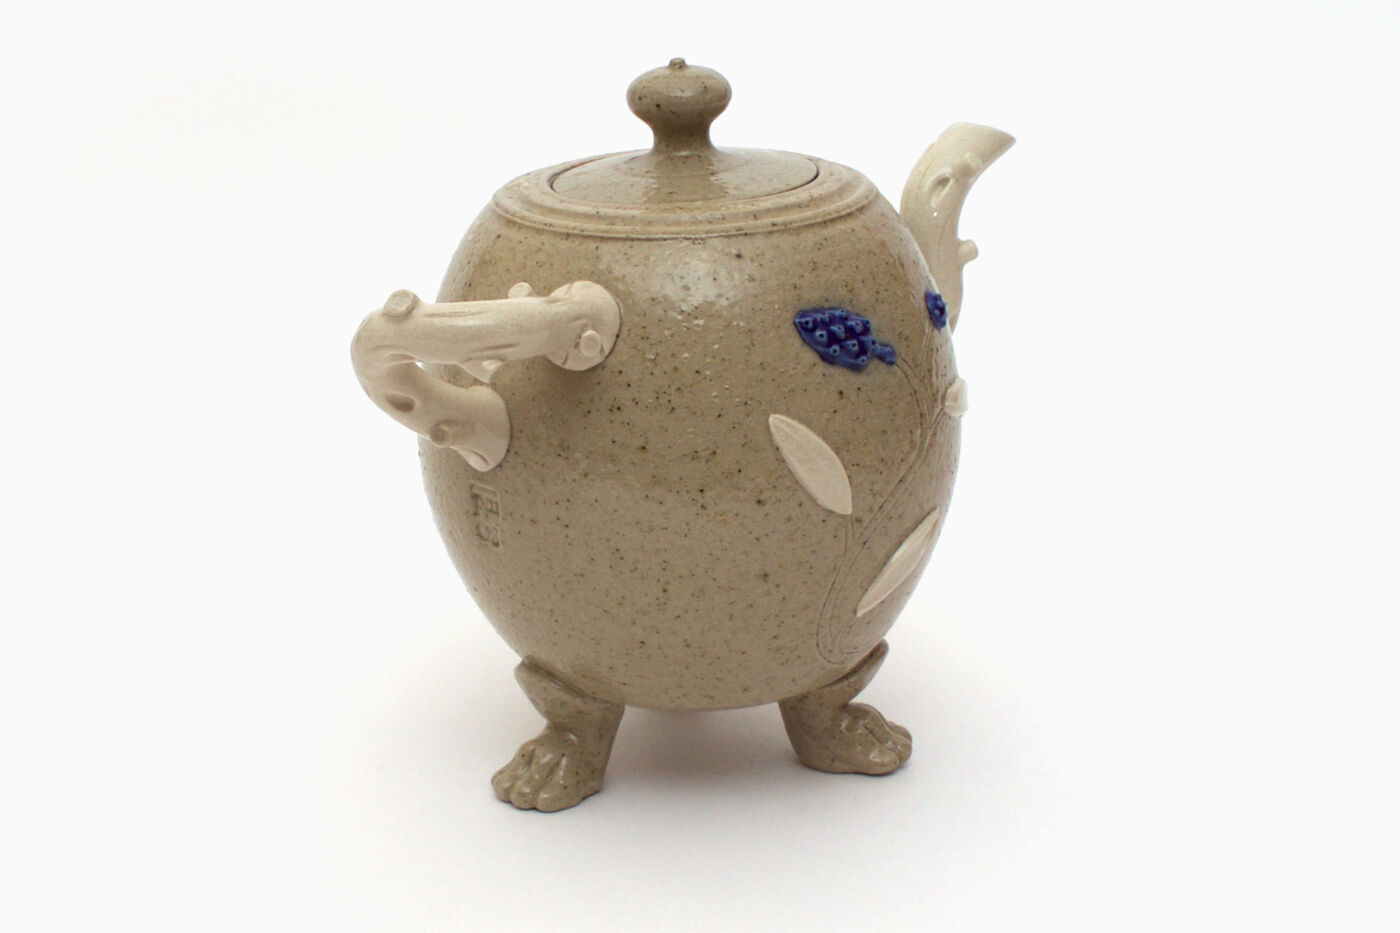 Peter Meanley Ceramic Tea Pot 026